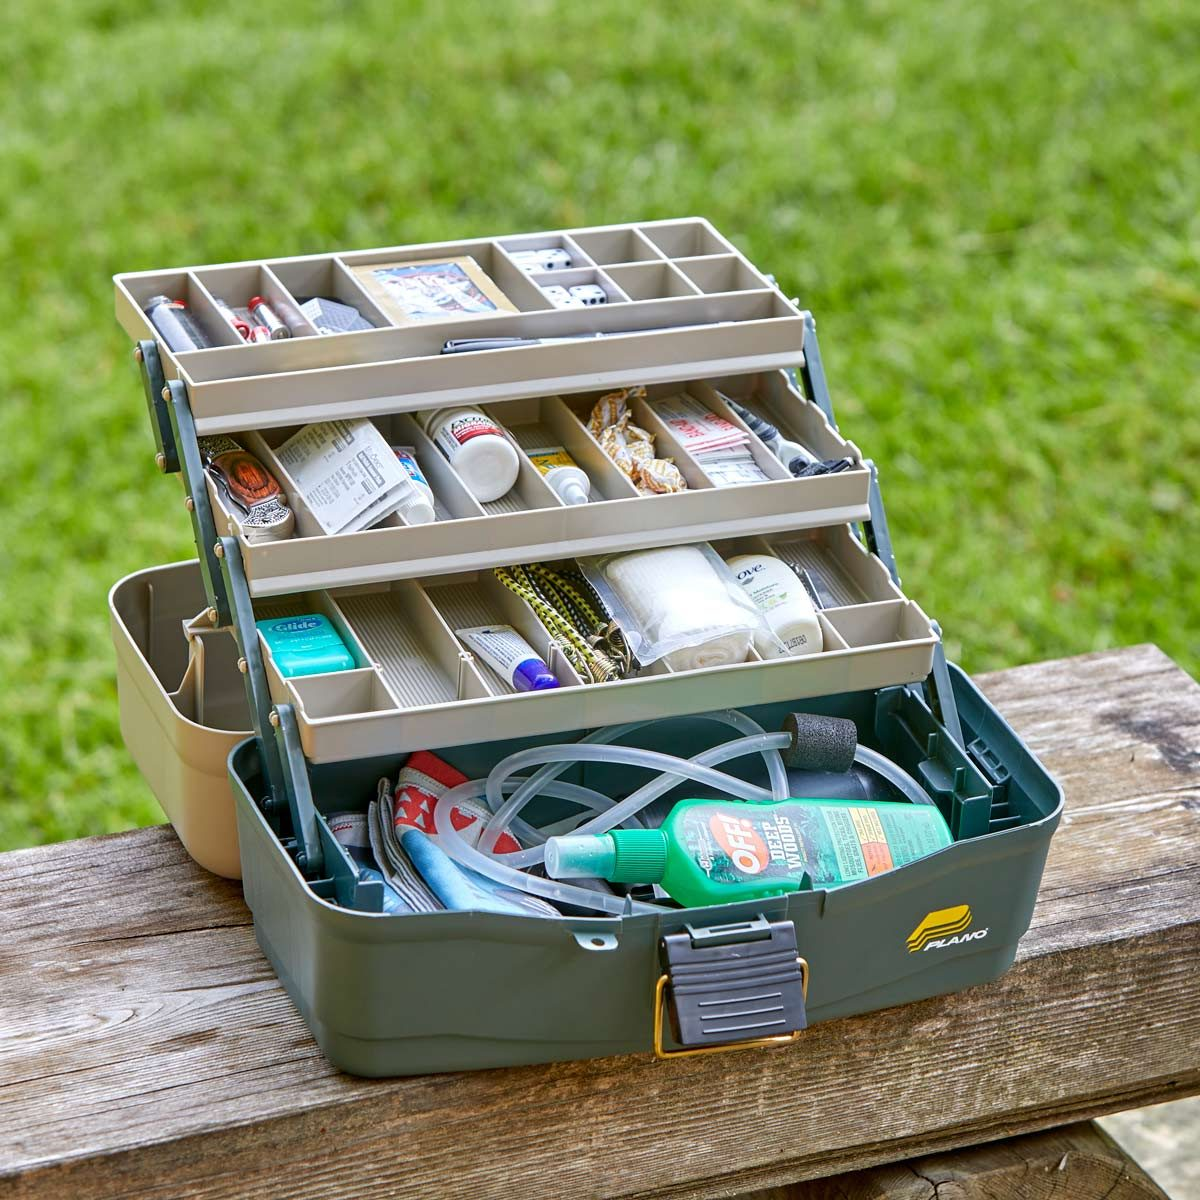 HH utility tackle box camping supplies